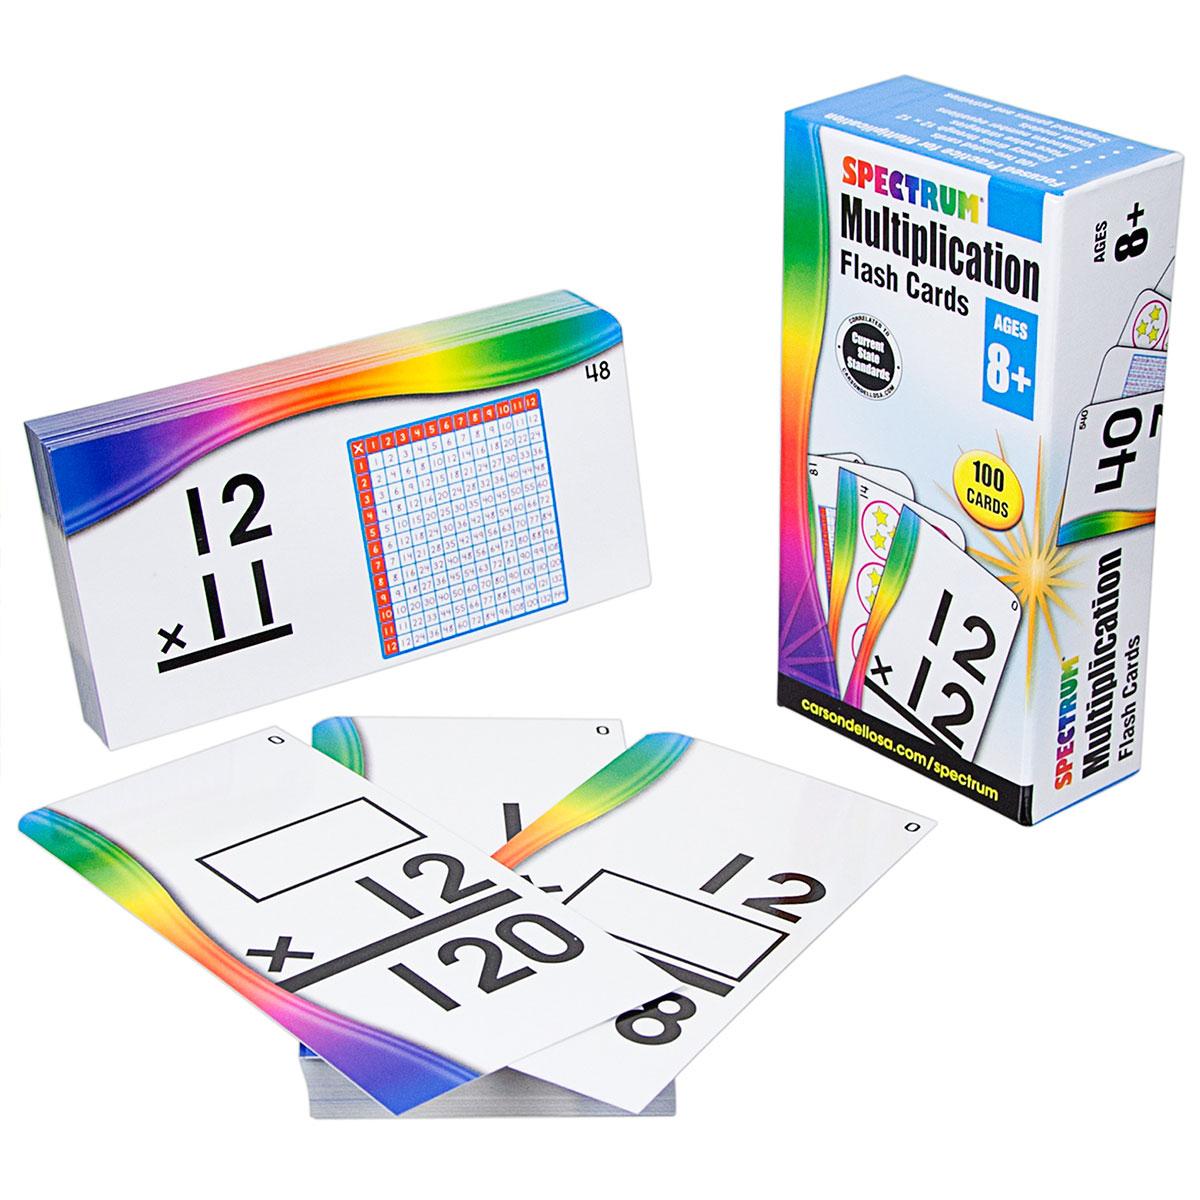 Flash Cards Packs - Multiplication - Carson Dellosa